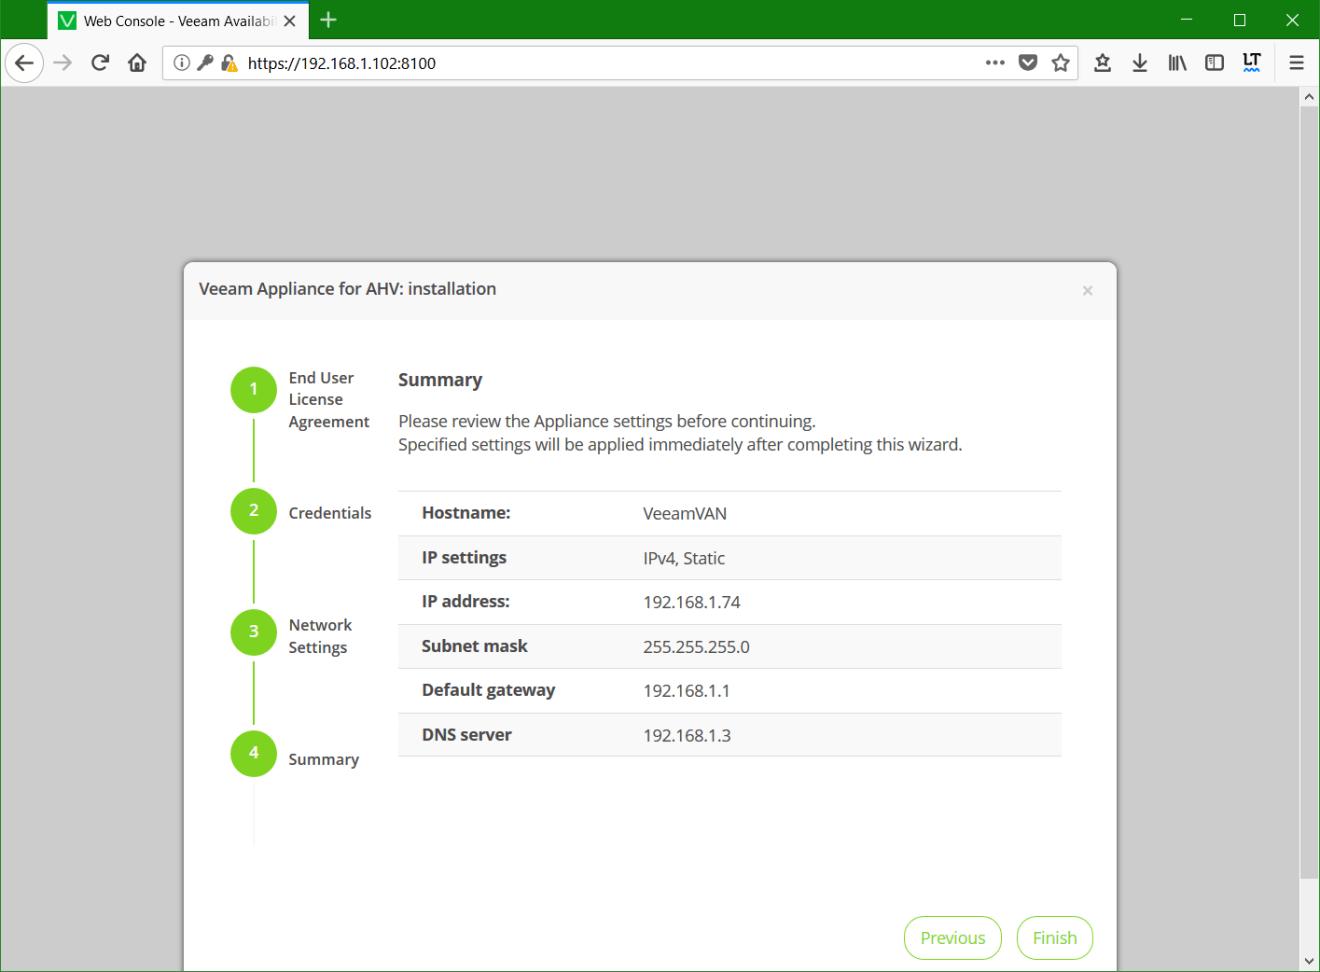 domalab.com Install Veeam VAN appliance summary